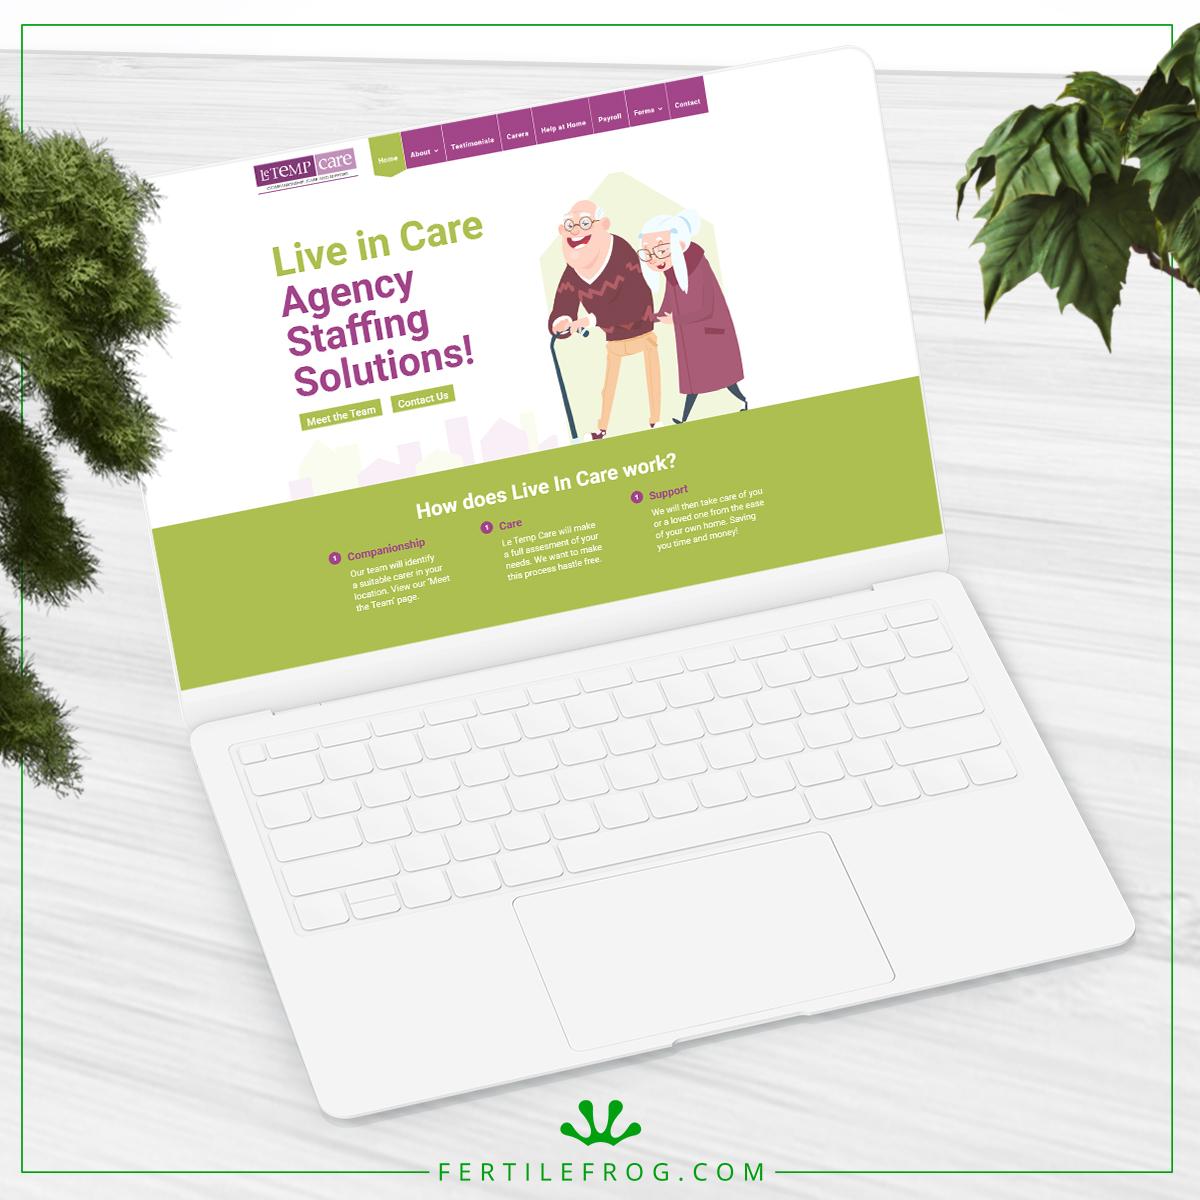 Le Temp Care Agency Website Build Laptop